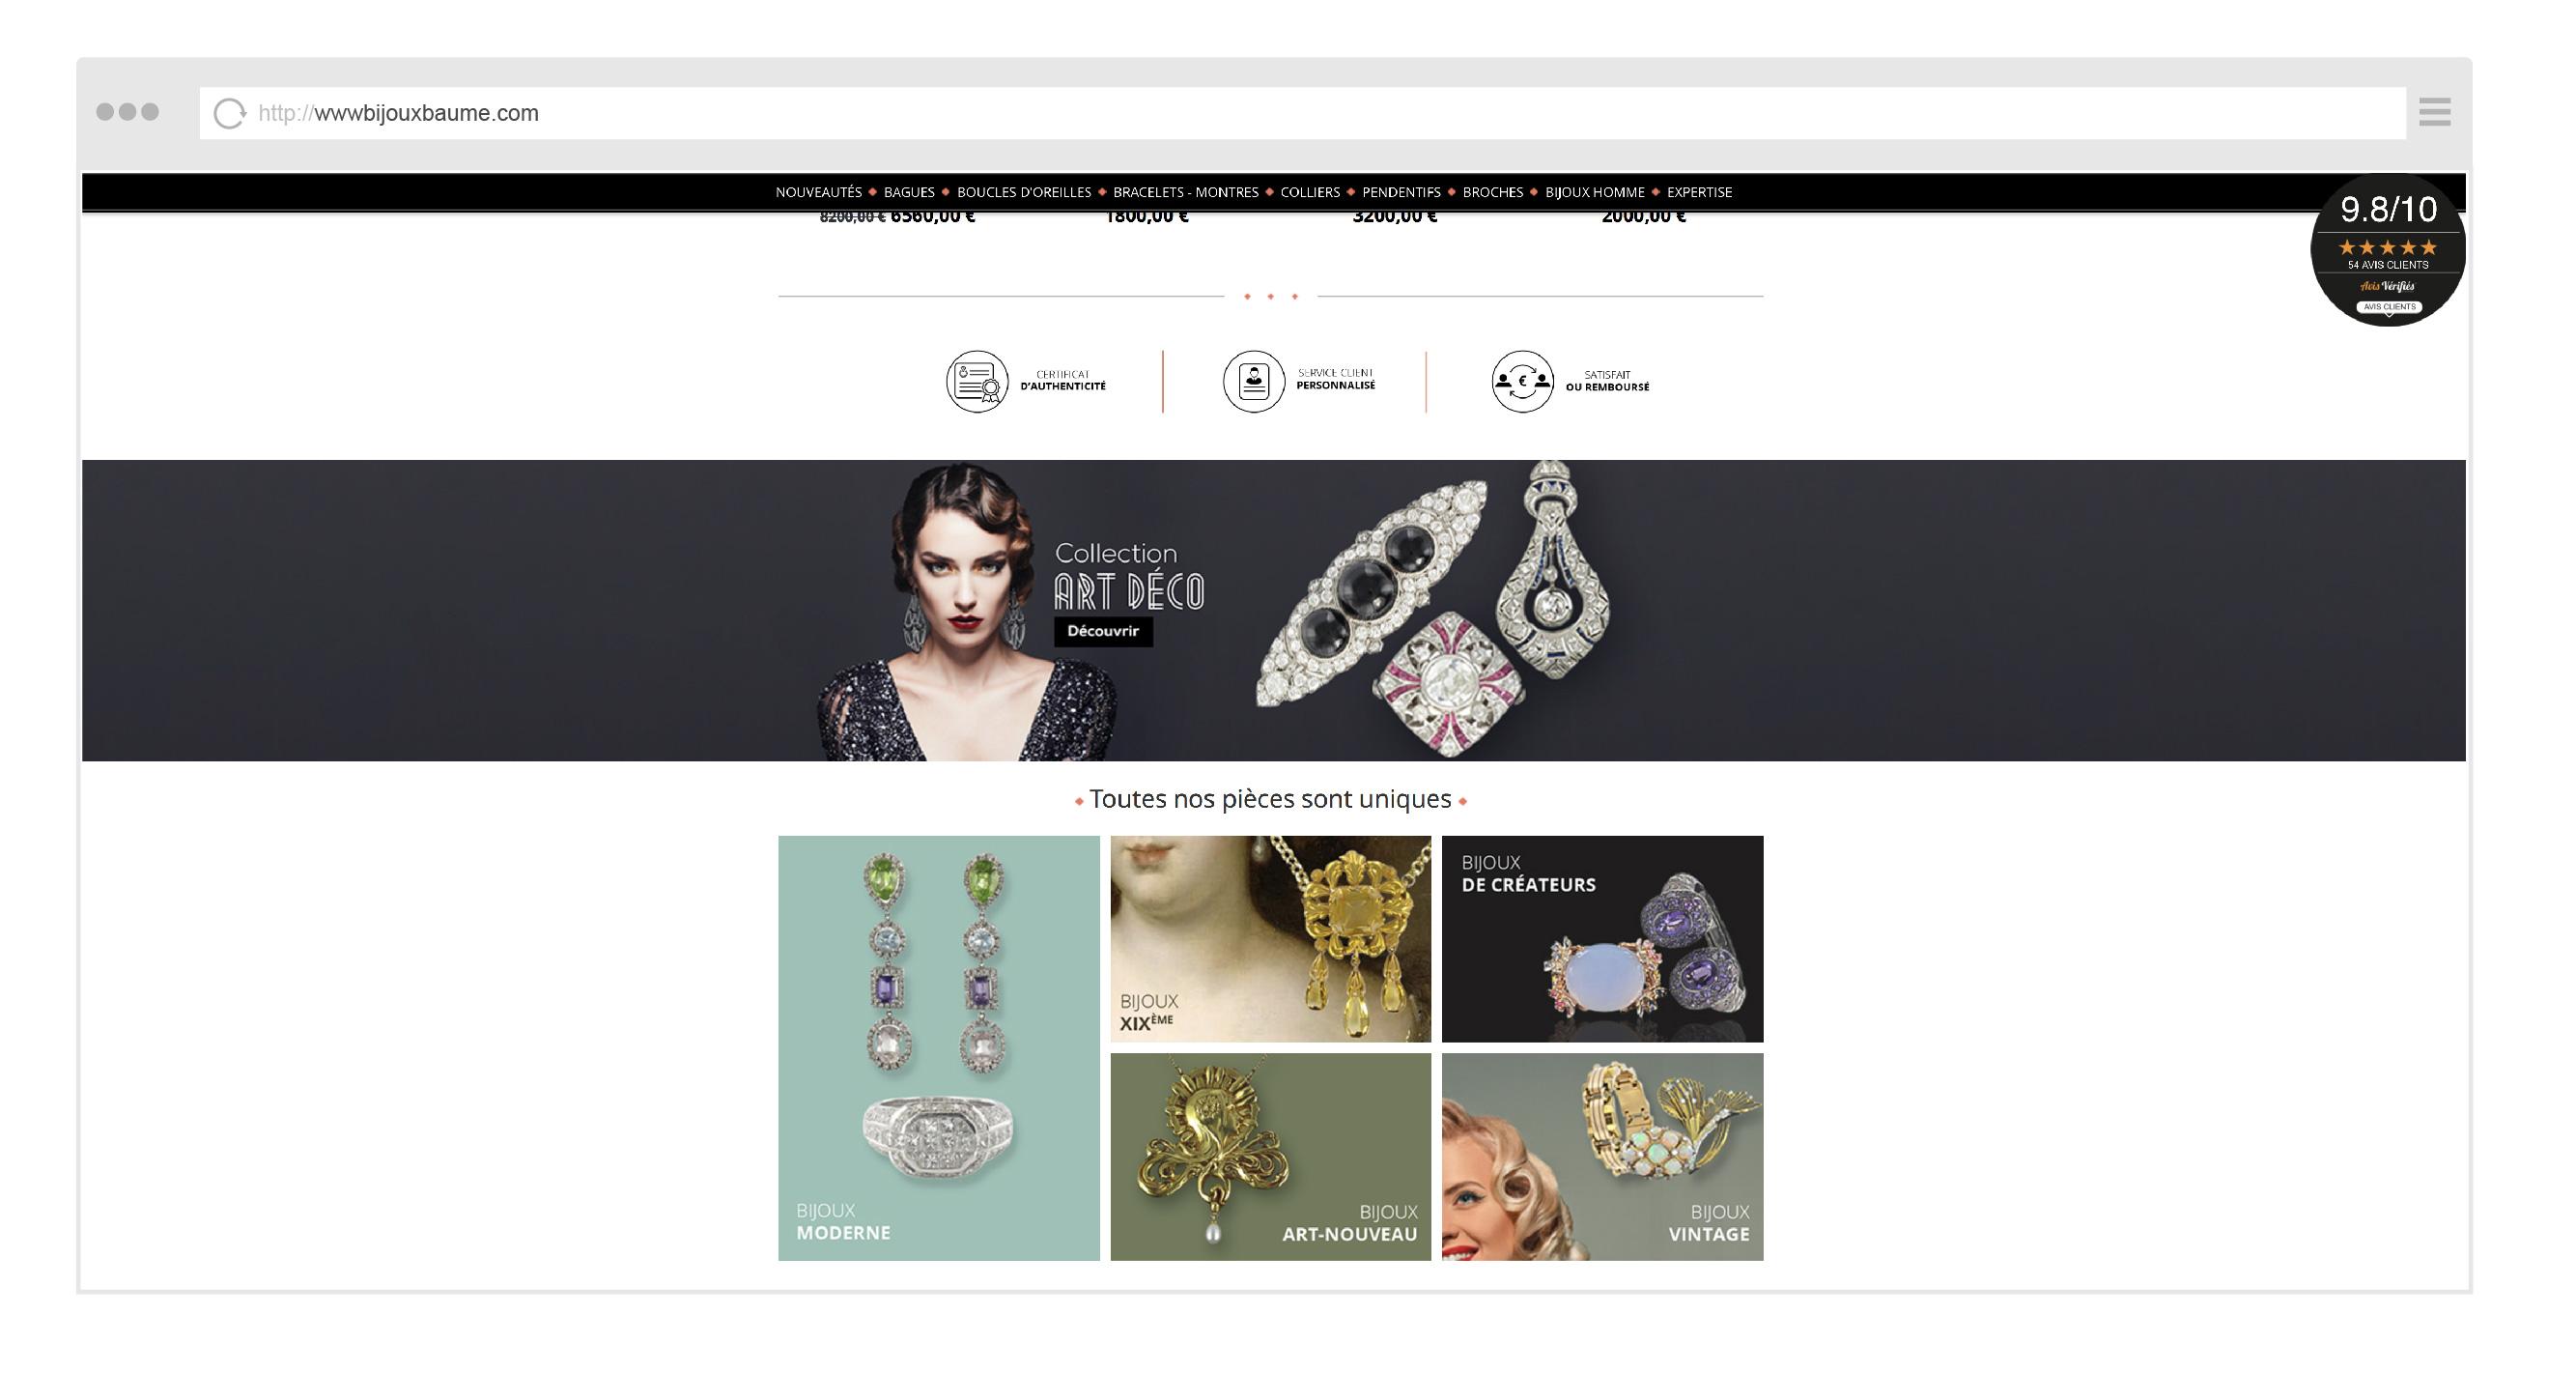 mariebabeau-graphiste-photographe-freelance-strasbourg-bijoux baume-photographie-bijoux-produit-web-banniere-2